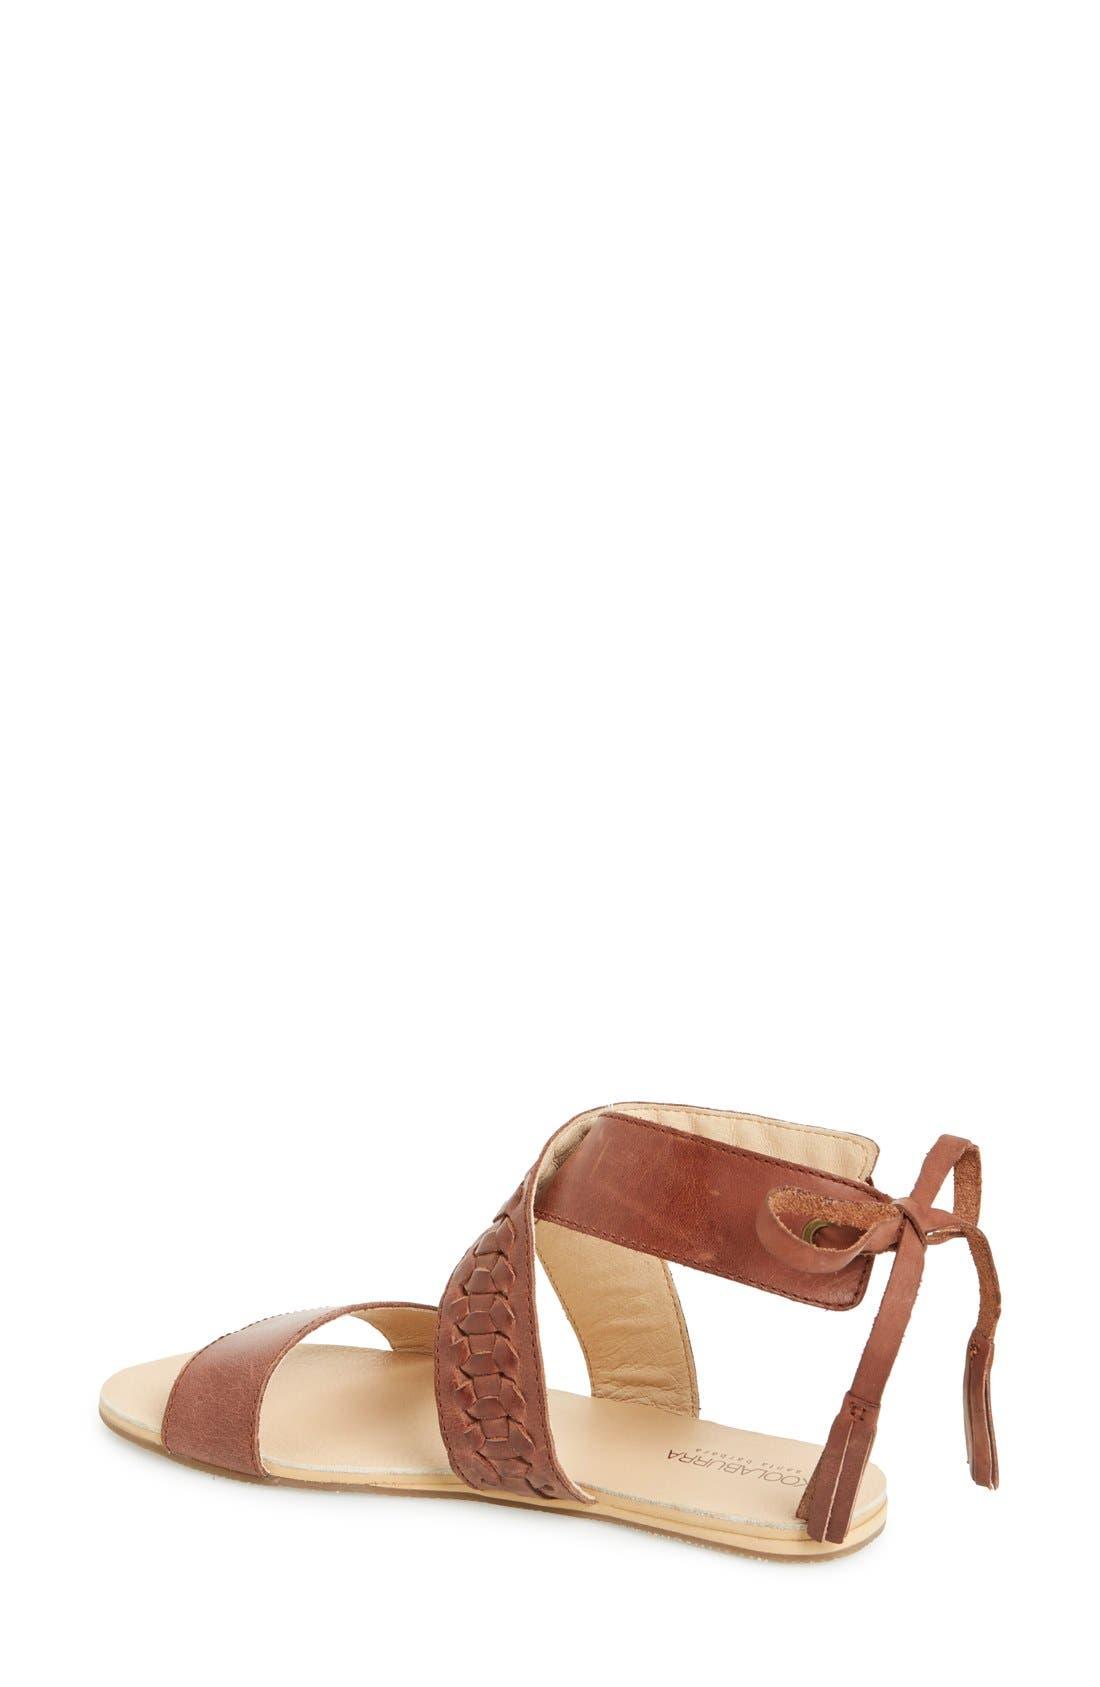 Alternate Image 2  - Koolaburra 'Alexa' Leather Ankle Strap Sandal (Women)